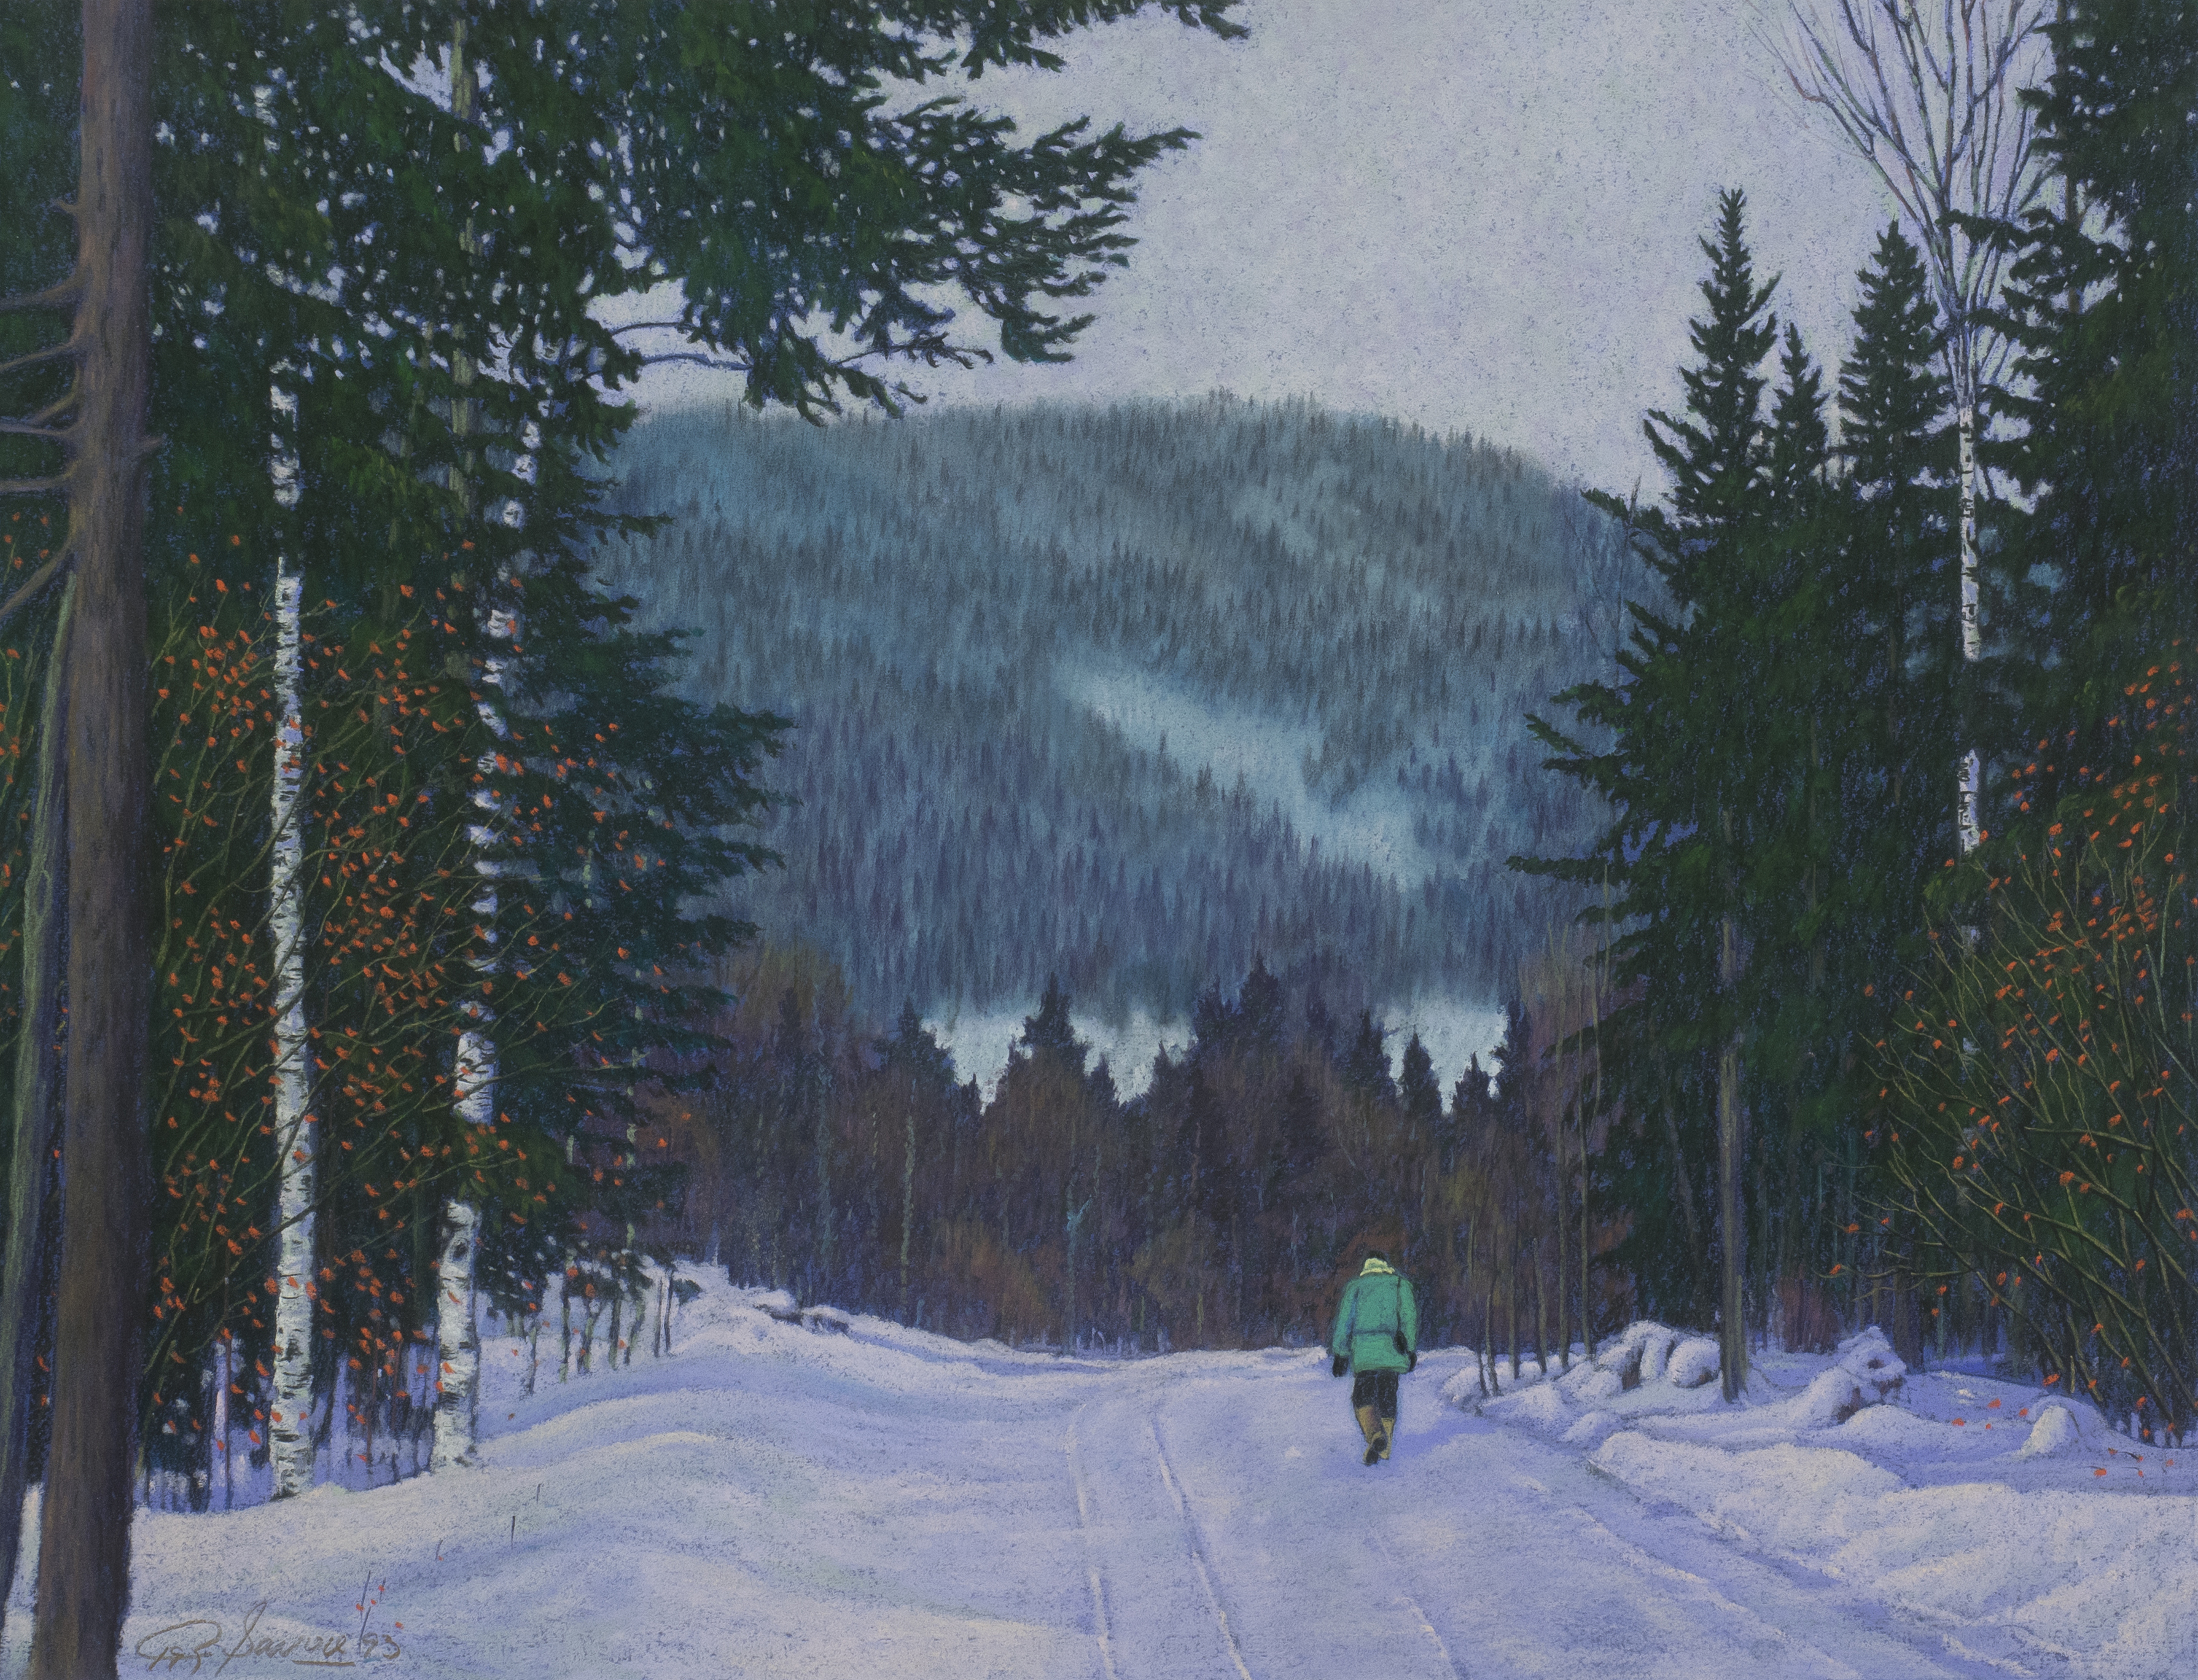 Walking the ski trail